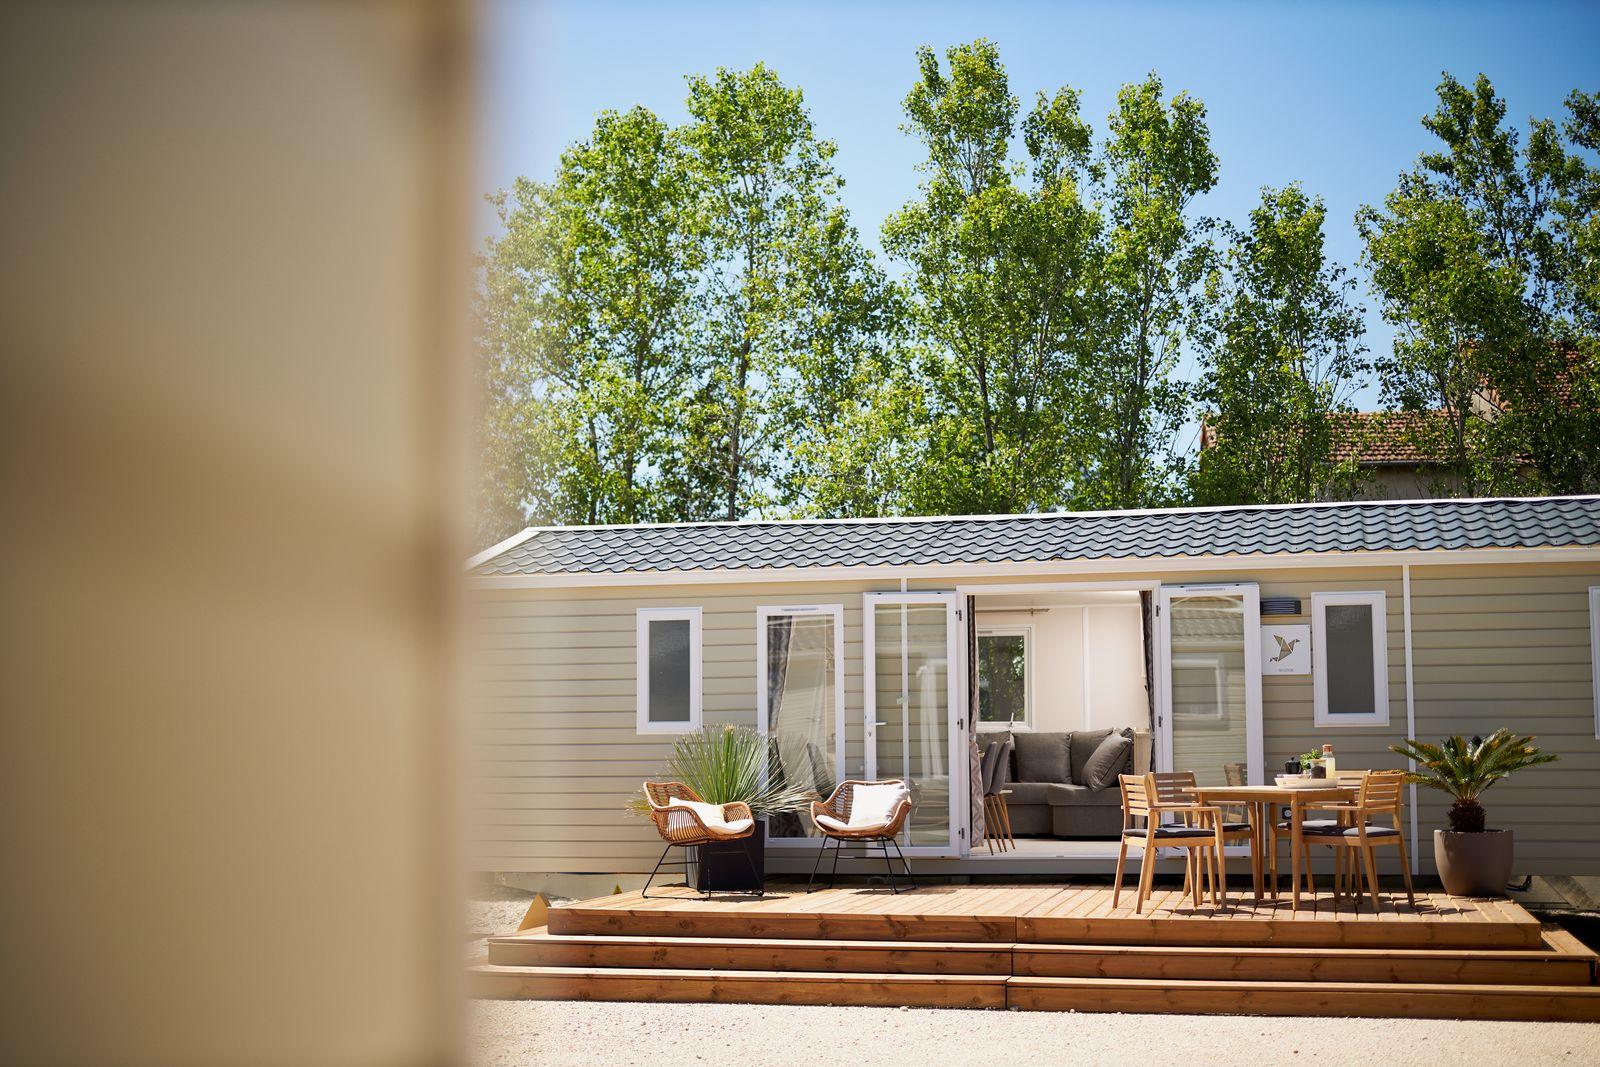 residences trigano-reglementation-mobil-home-installation